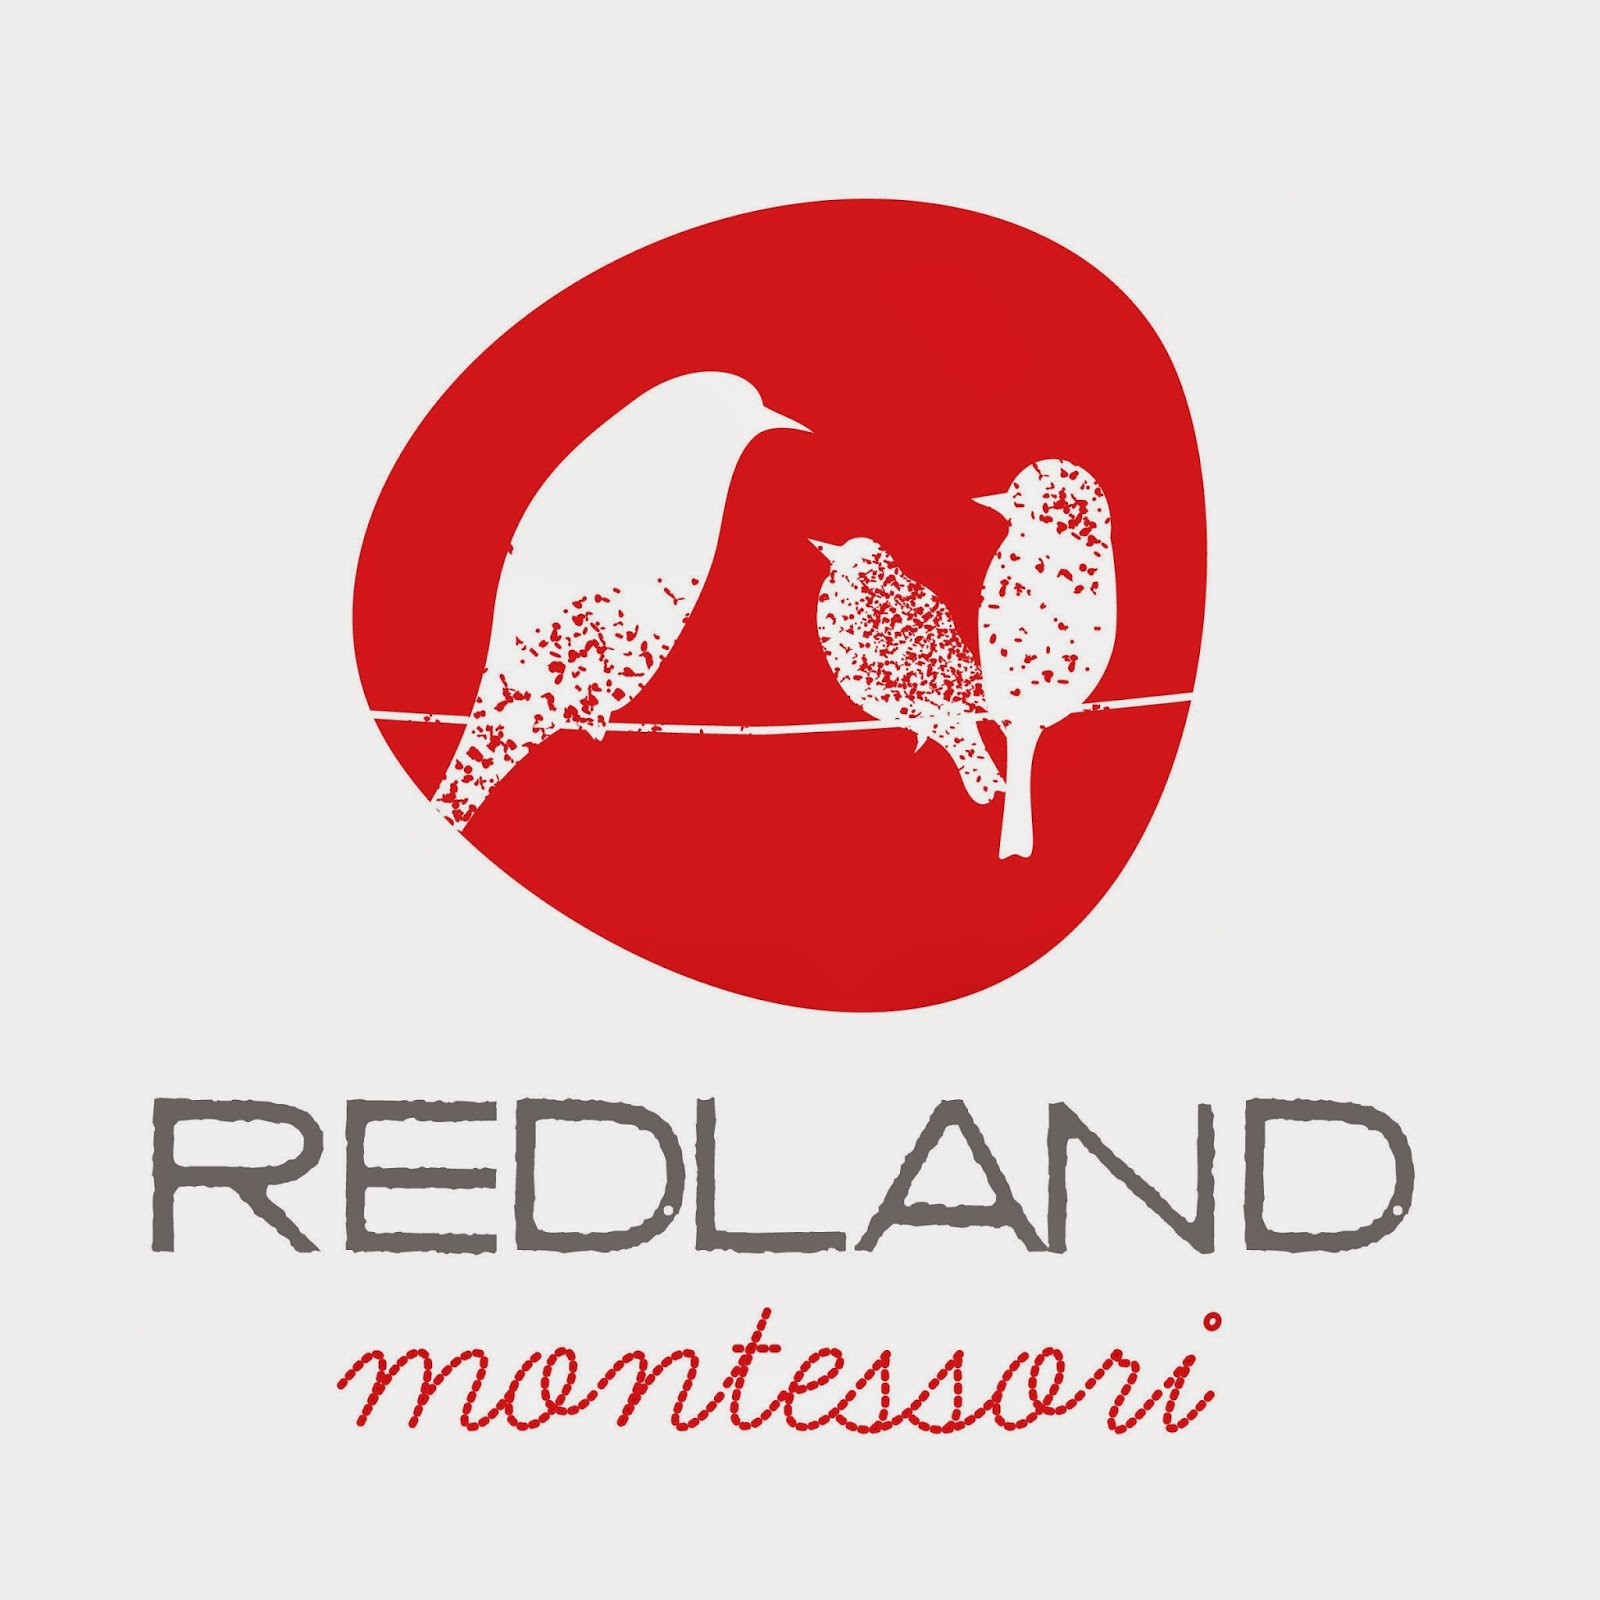 REDLAND MONTESSORI